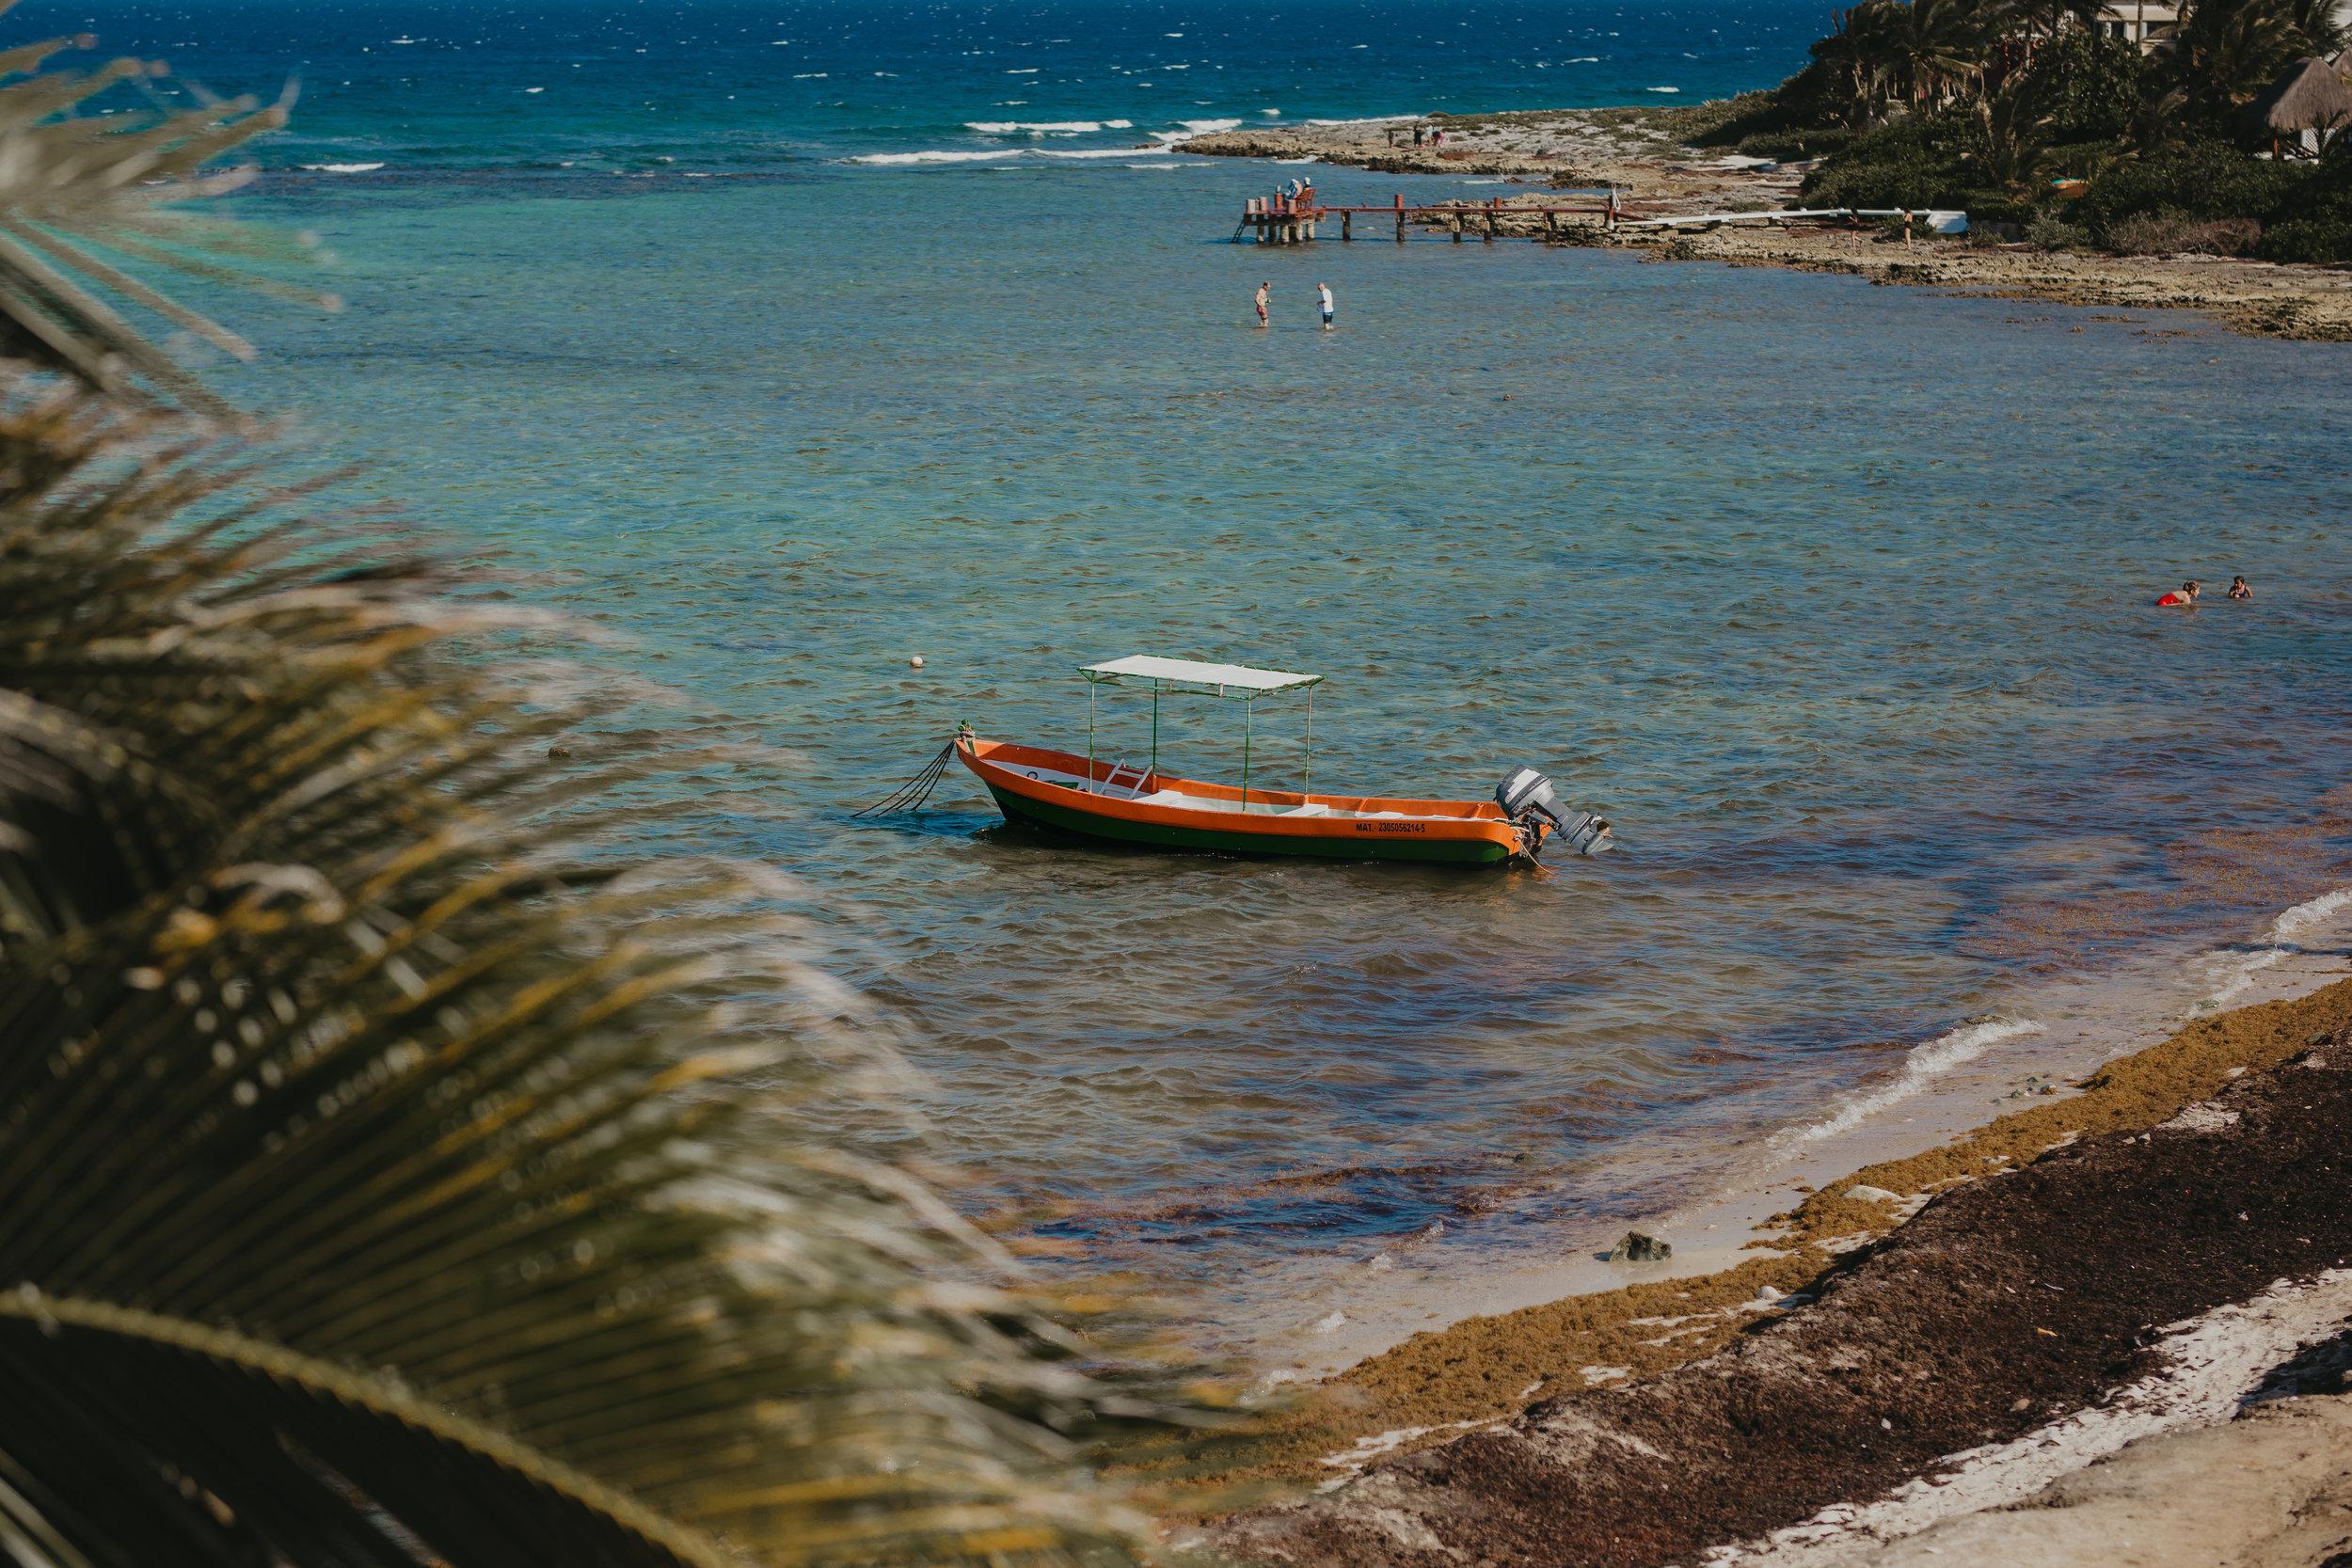 Nicole-Daacke-Photography-beachfront-akumal-destionation-wedding-tulum-mexico-elopement-photographer-destination-wedding-inspiration-sunset-champagne-pop-boho-bride-ocean-tropical-bohemian-tulum-wedding-photos-143.jpg